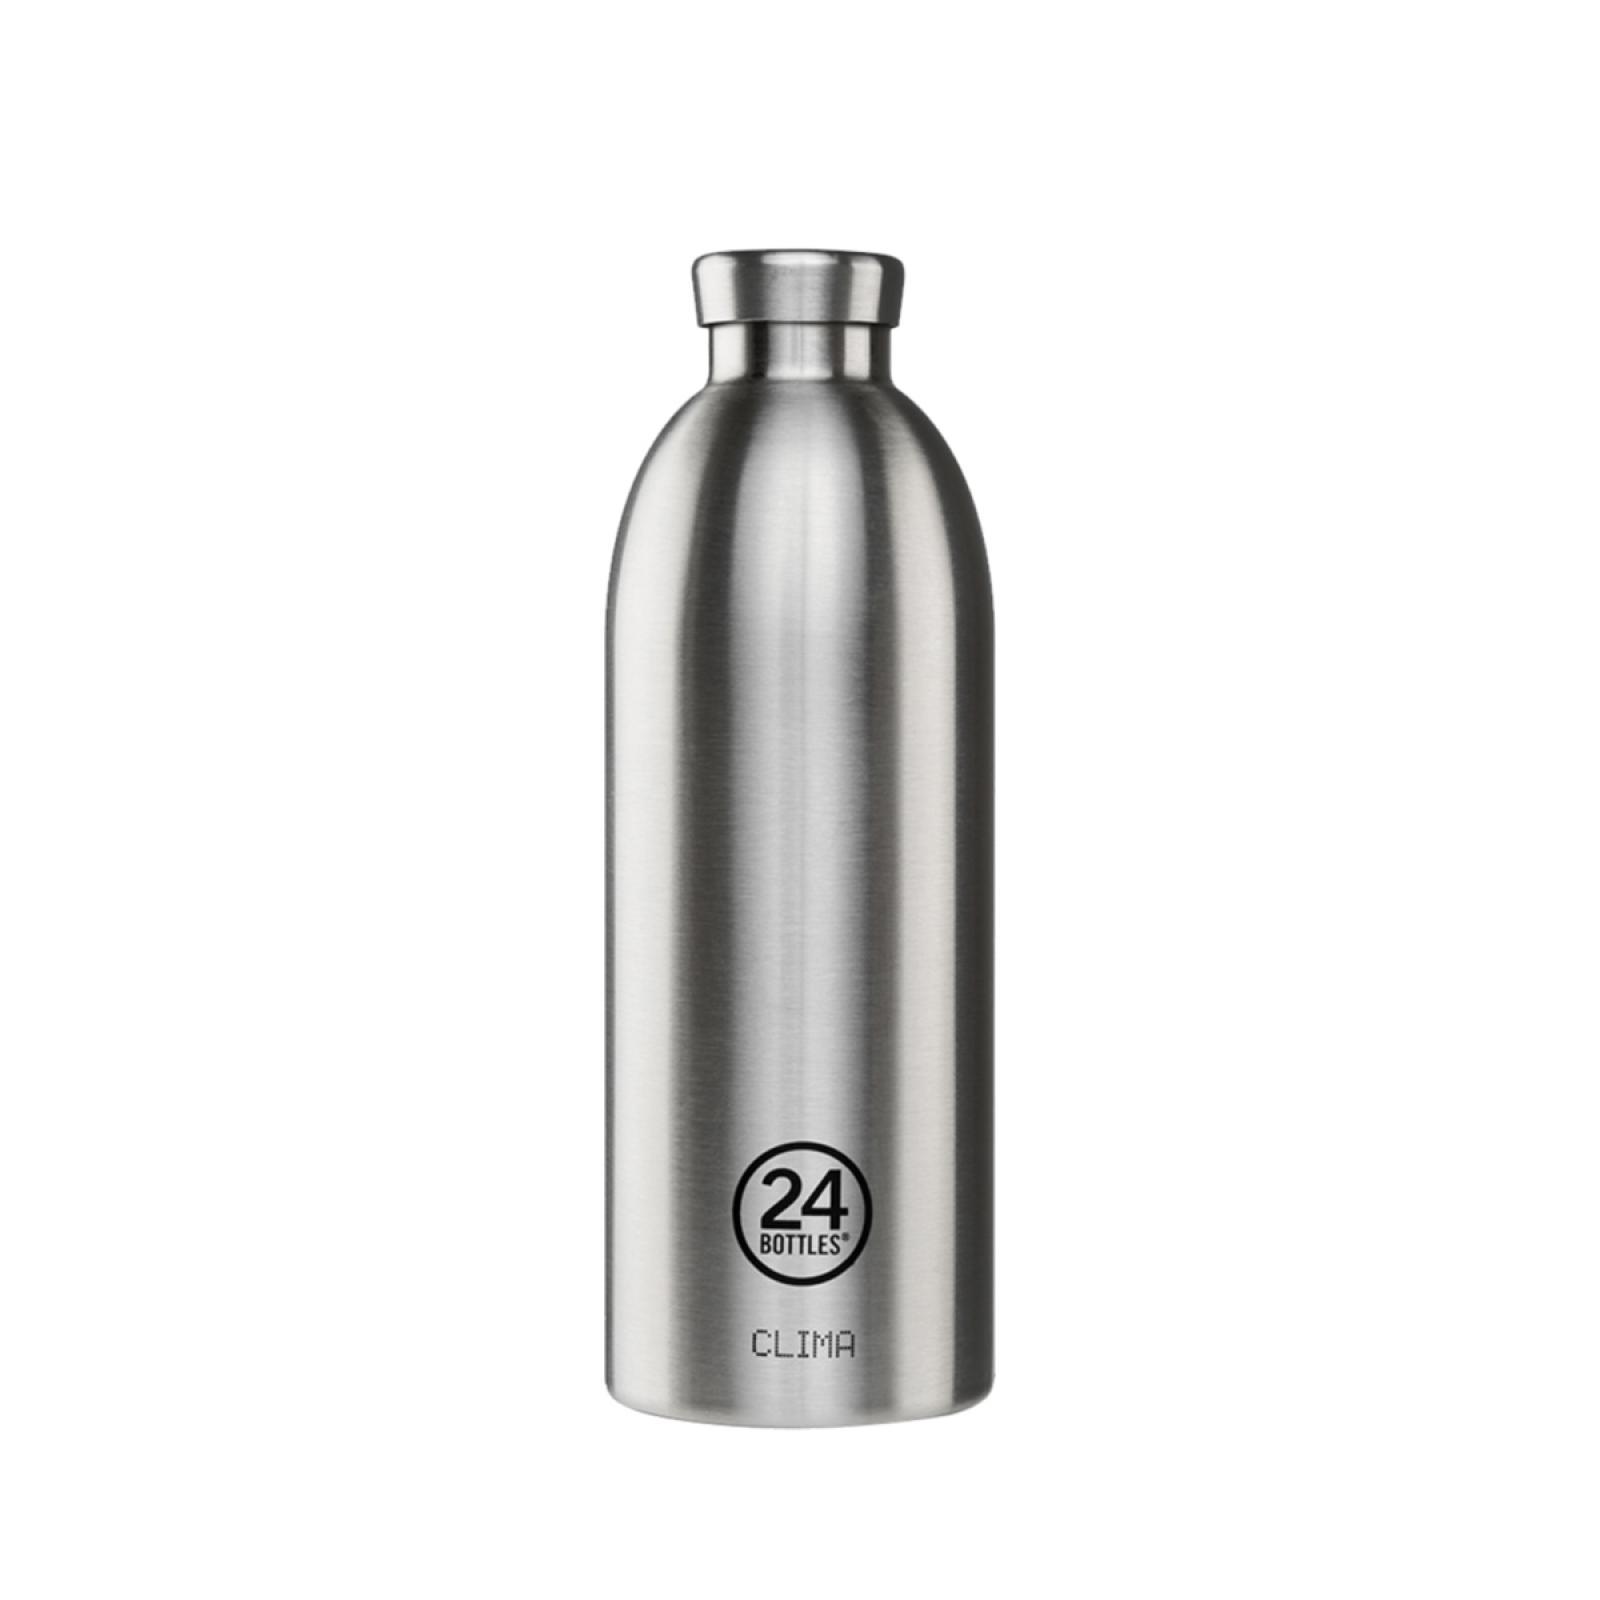 24 Bottles Clima Bottle Steel 850 ml - 1